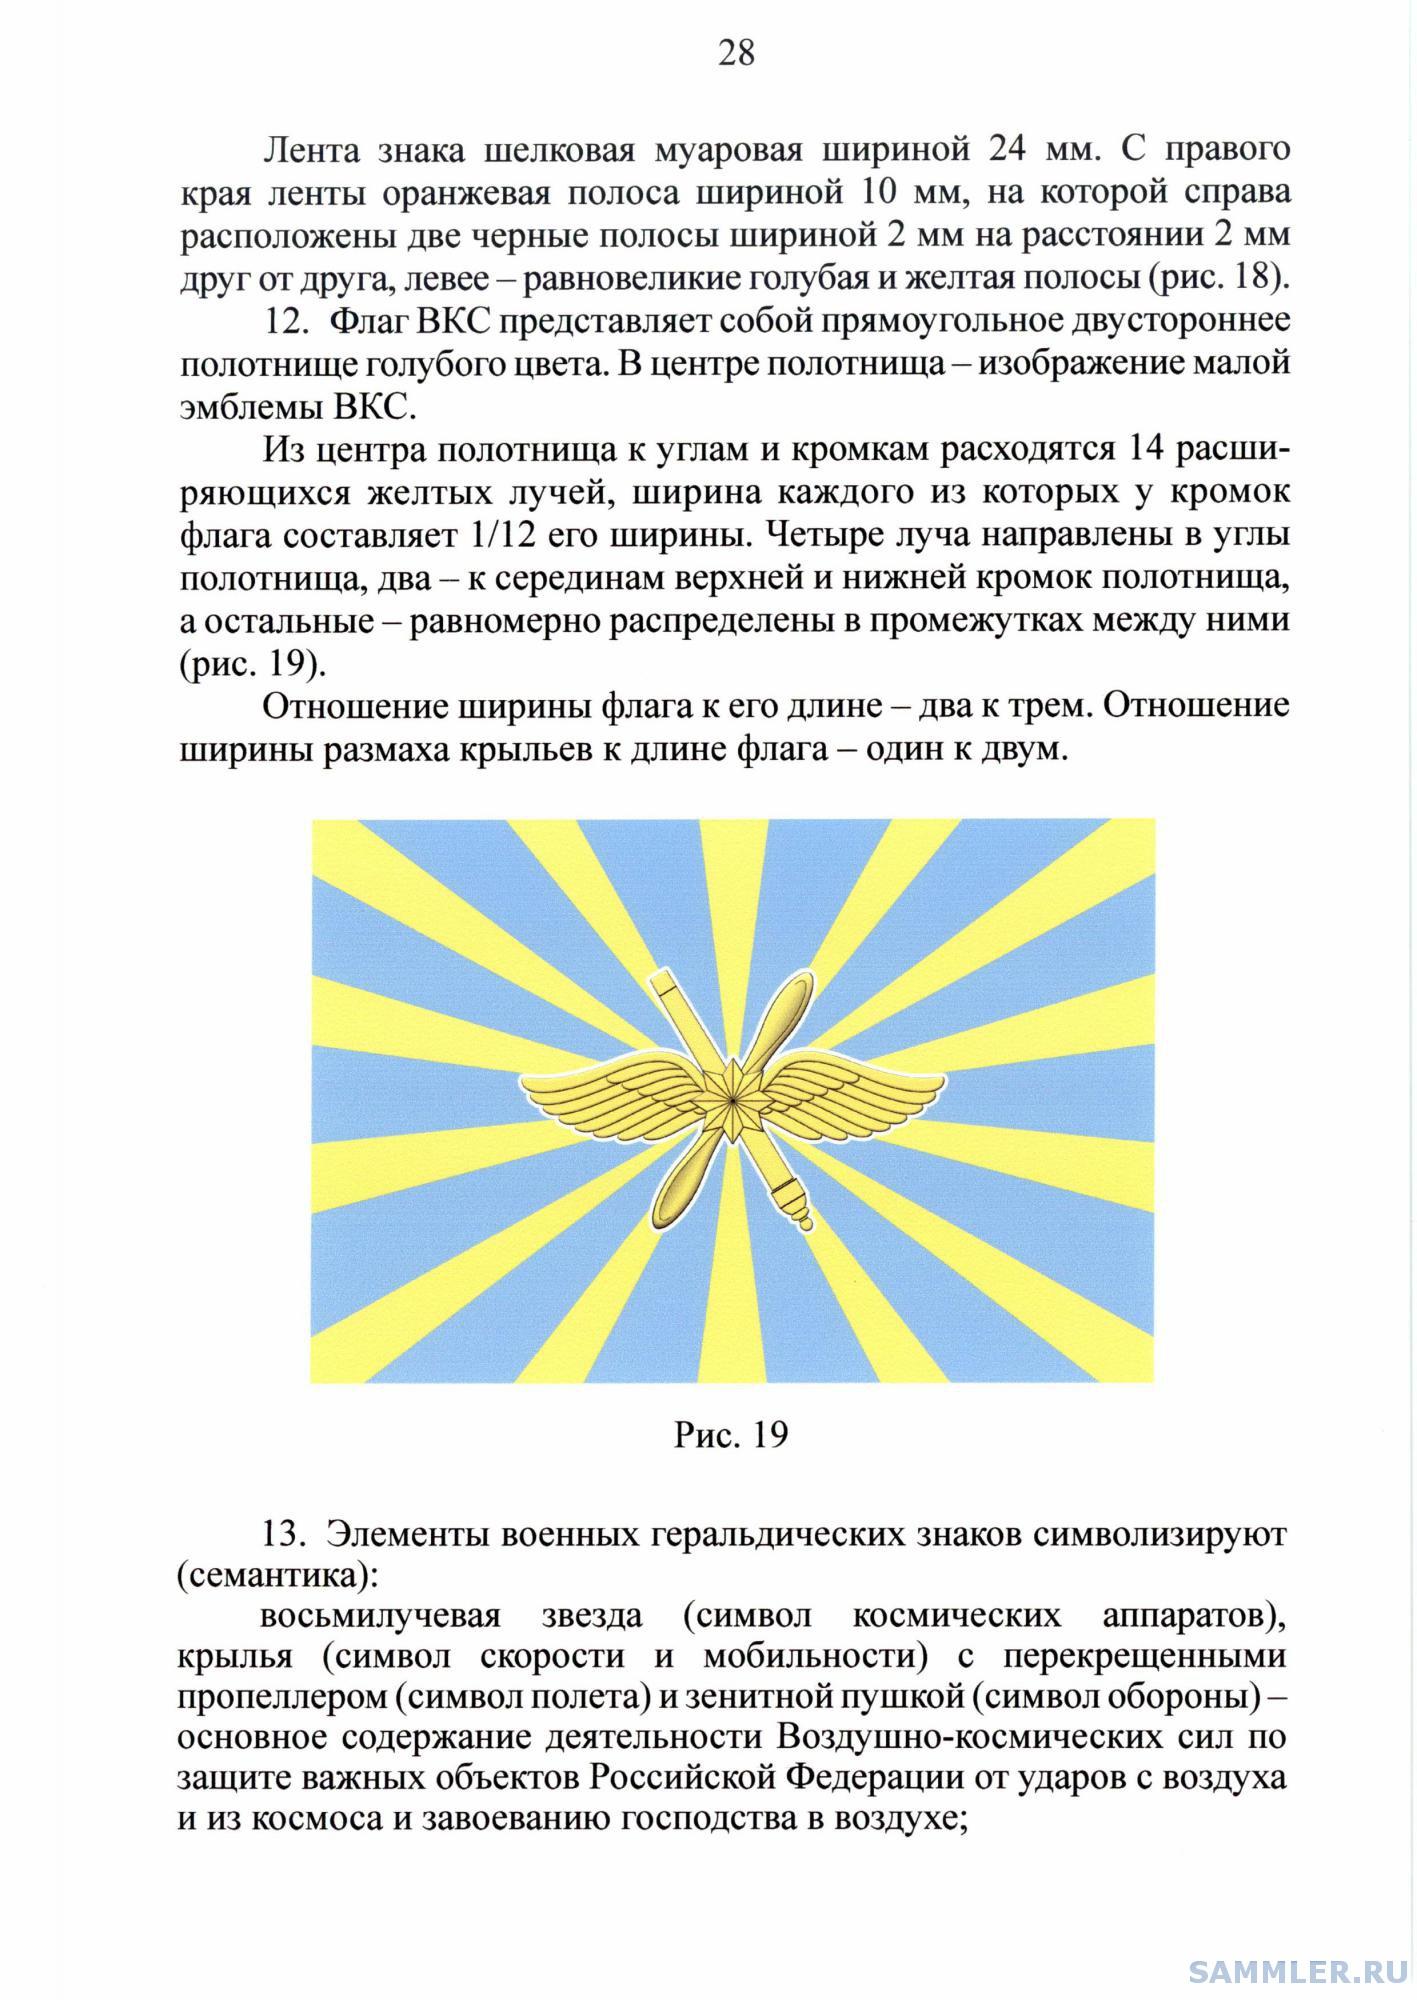 МО РФ 470(цвет)-28.jpg